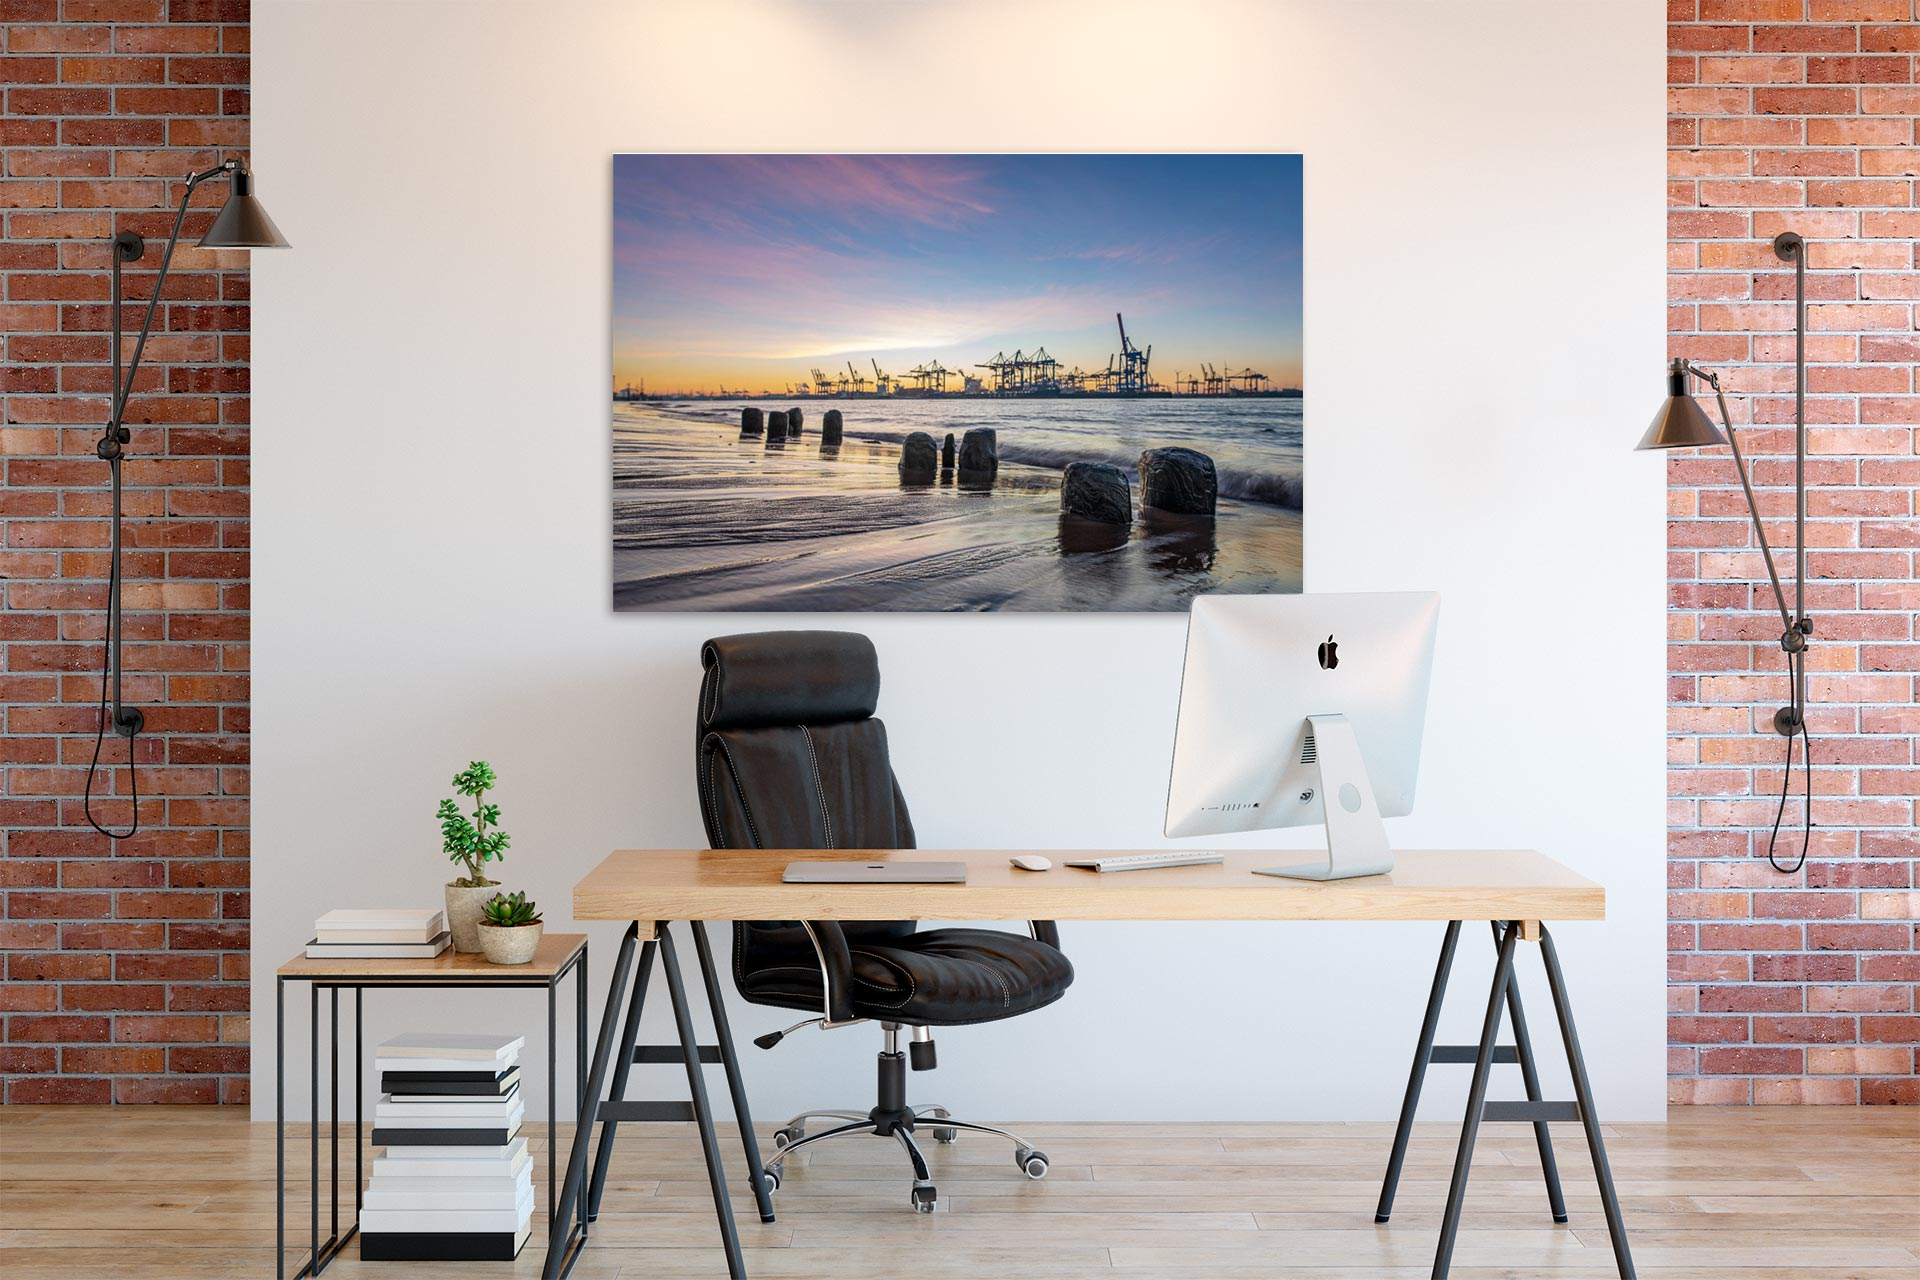 LCW271-dawn-hamburg-wandbild-bild-auf-leinwand-acrylglas-aludibond_buero